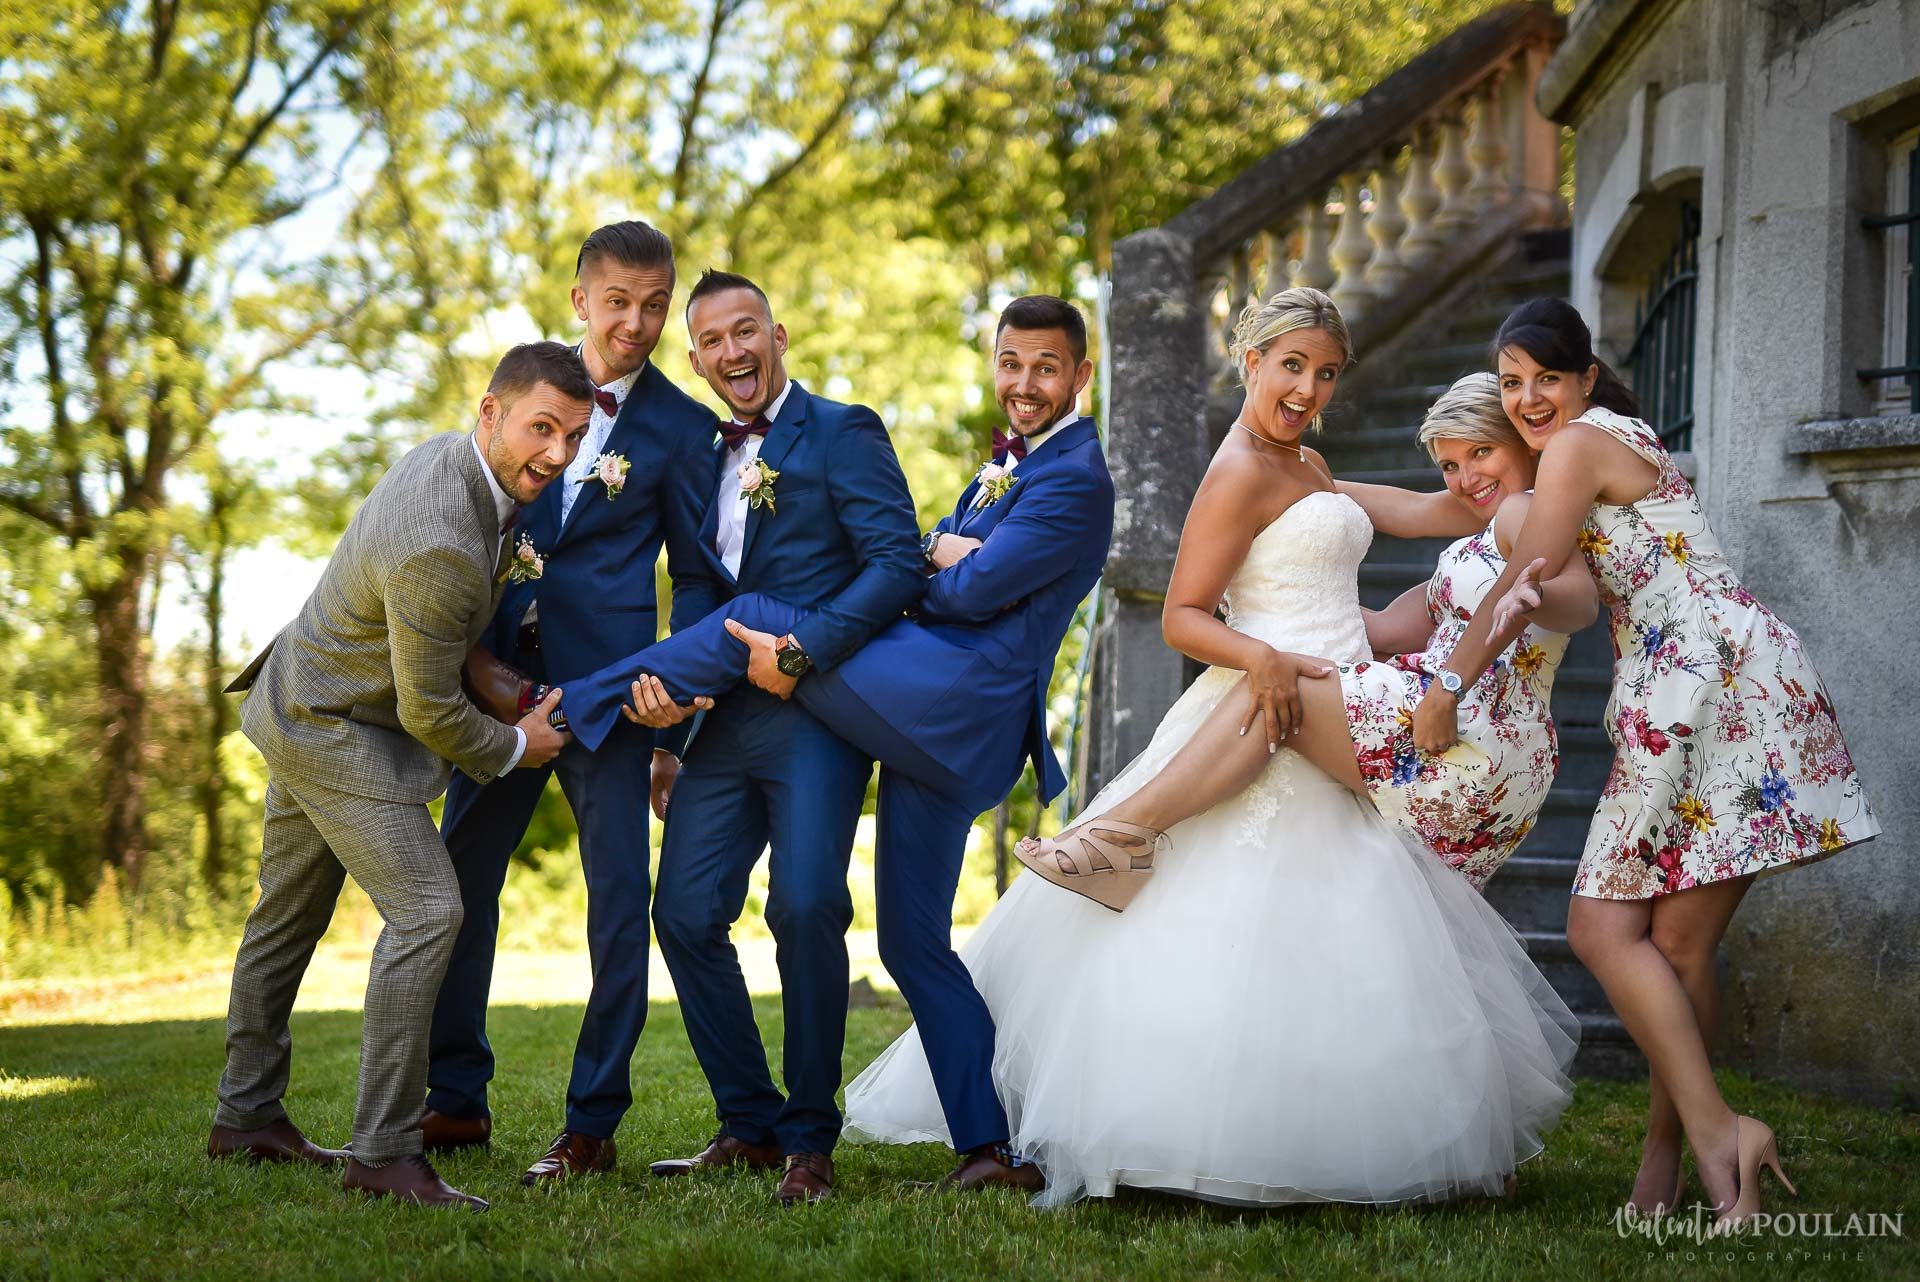 Mariage fun Petit Wettolsheim - Valentine Poulain rocknroll